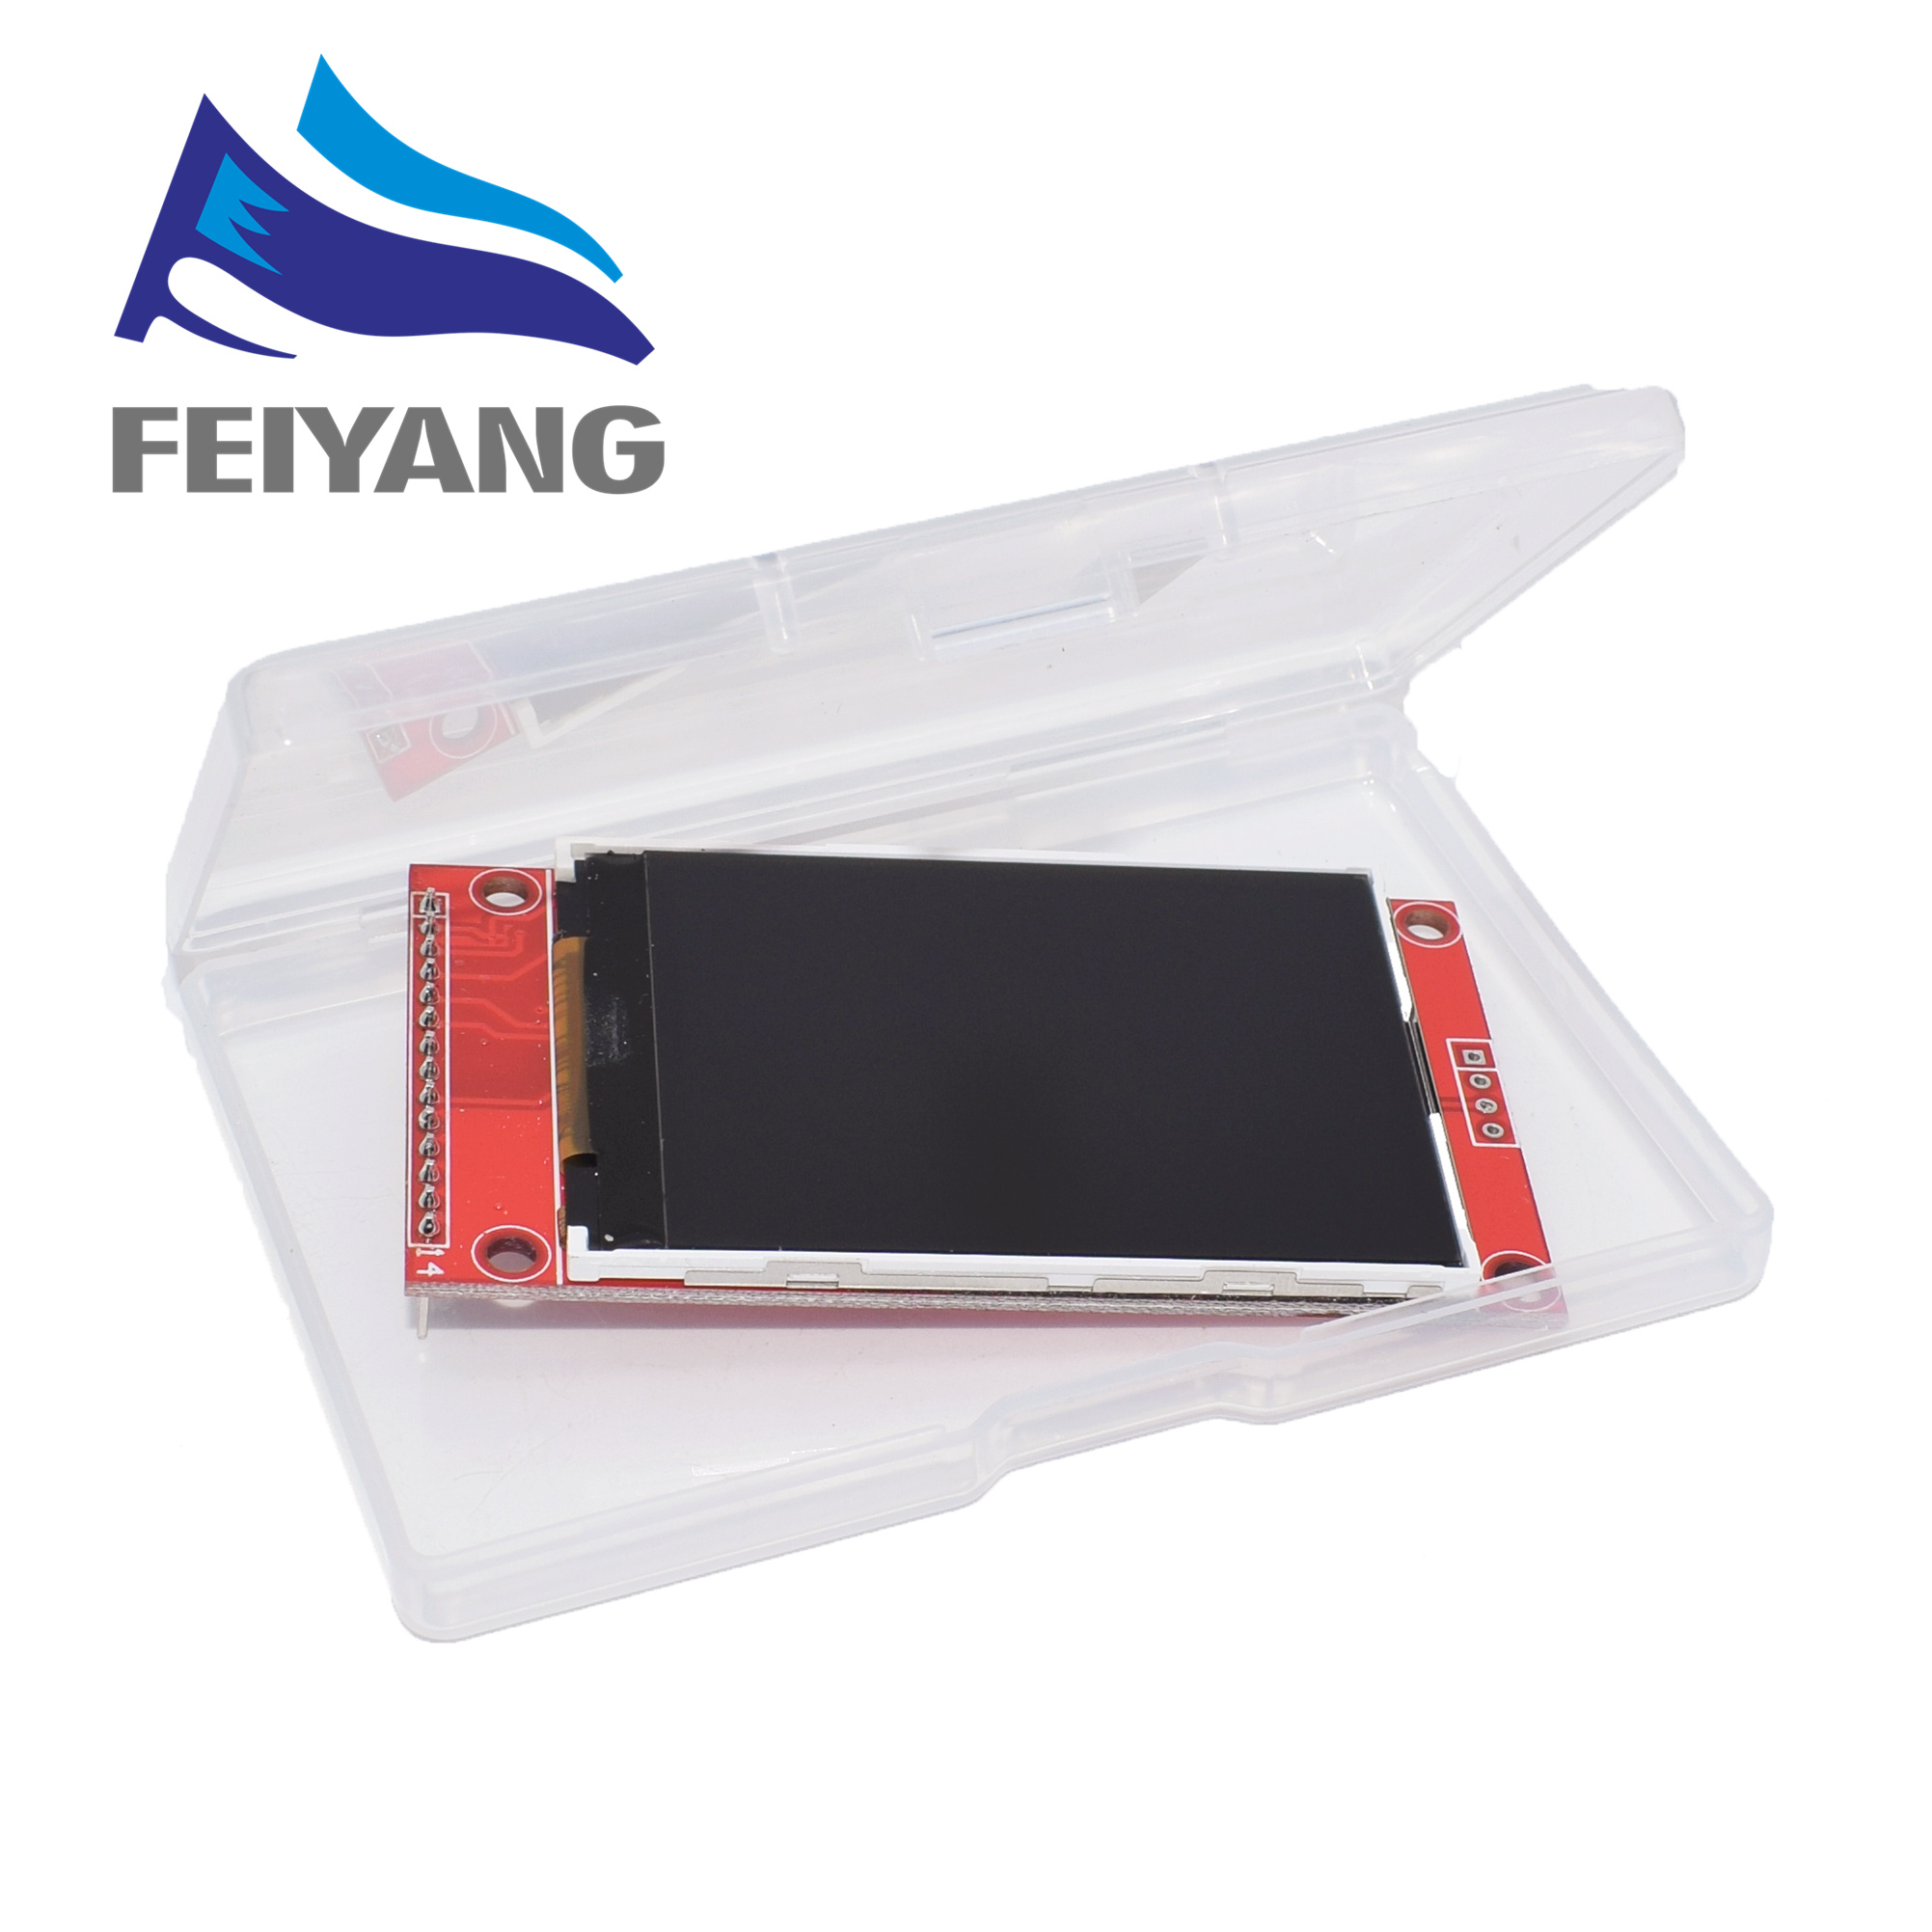 "2.4 ""2.4 polegada 240x320 spi tft lcd módulo de porta serial 5 v/3.3 v pcb adaptador micro cartão sd ili9341 display lcd branco led"